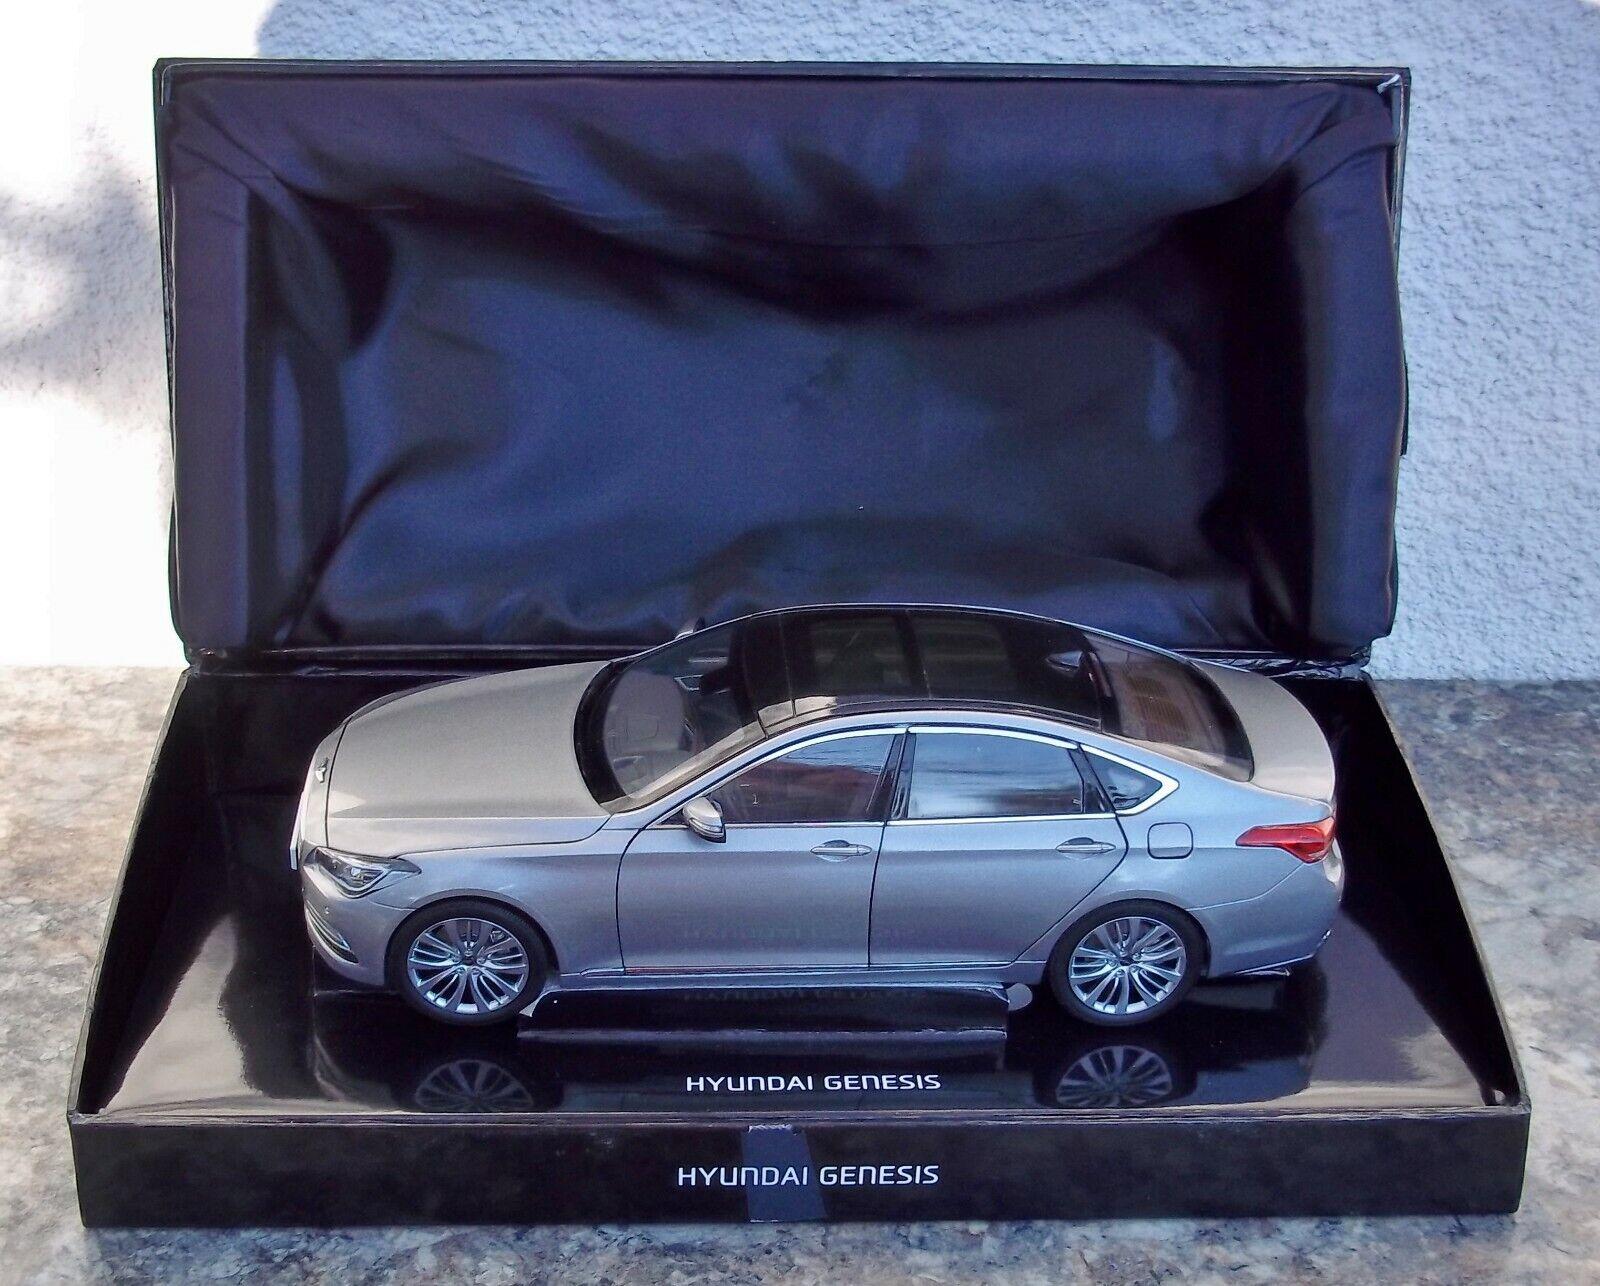 Minikraft Modelos 2014 Hyundai Genesis 1 18 argento Diecast Modelo Coche Raro Distribuidor